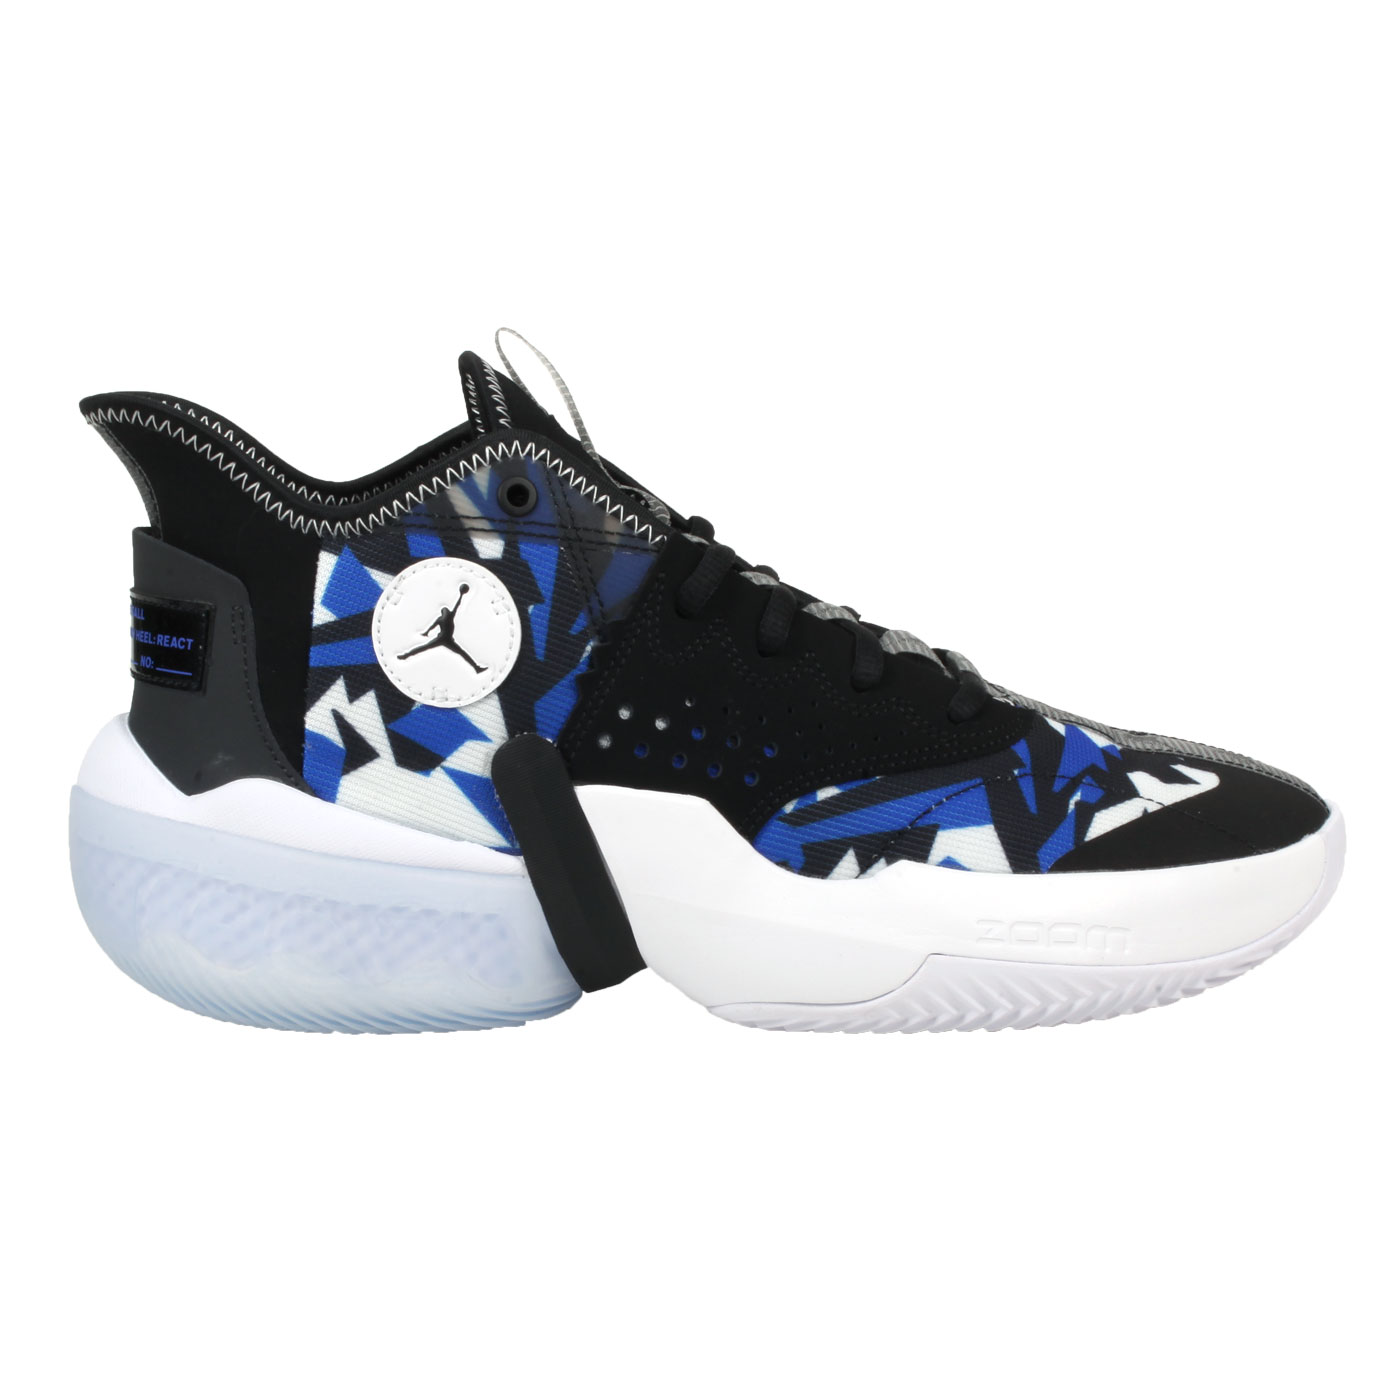 NIKE 限量-男款喬丹籃球鞋  @JORDAN REACT ELEVATION PF@CK6617004 - 黑藍白